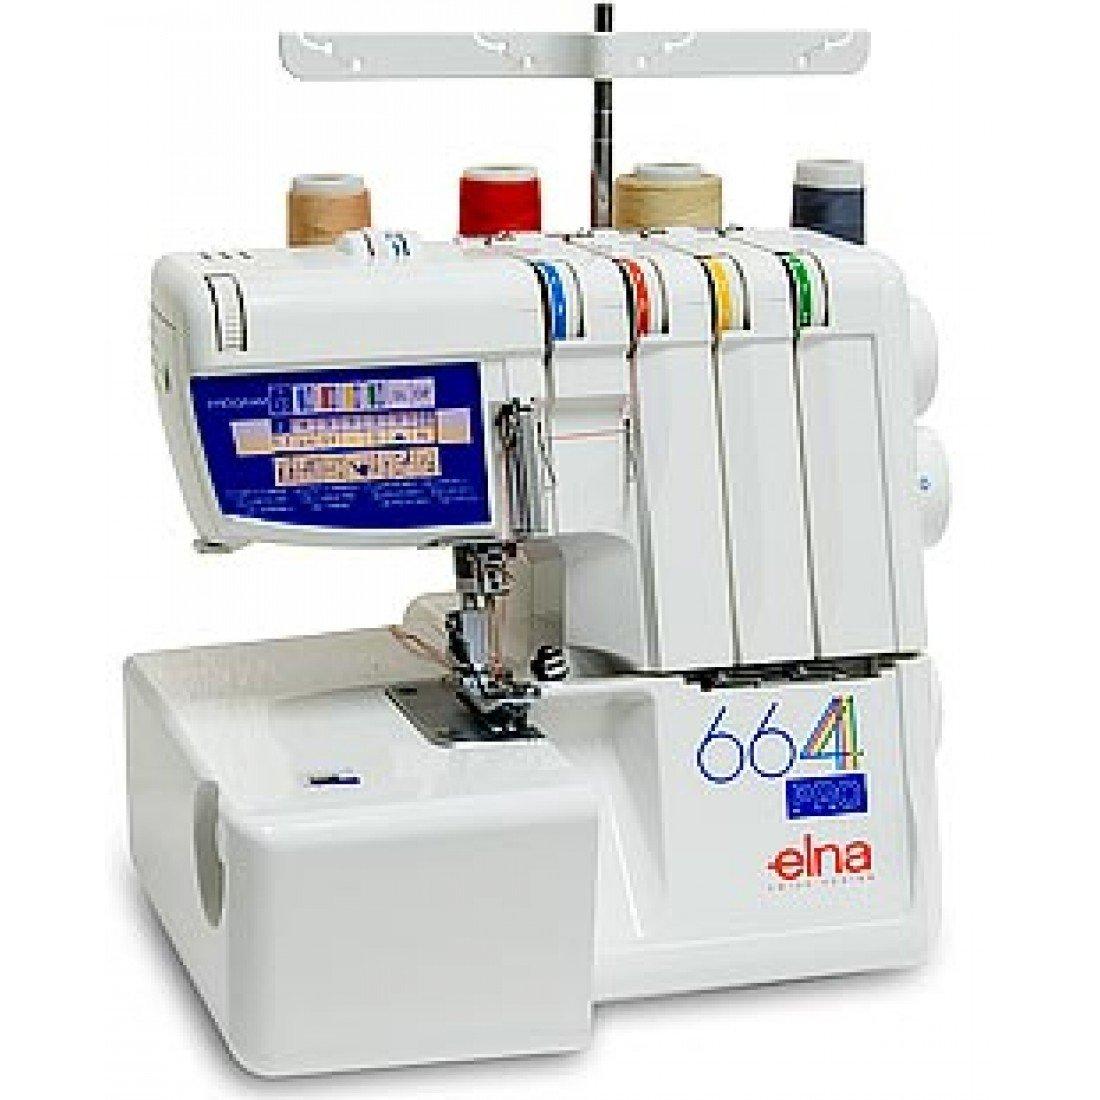 elna serger sewing machine